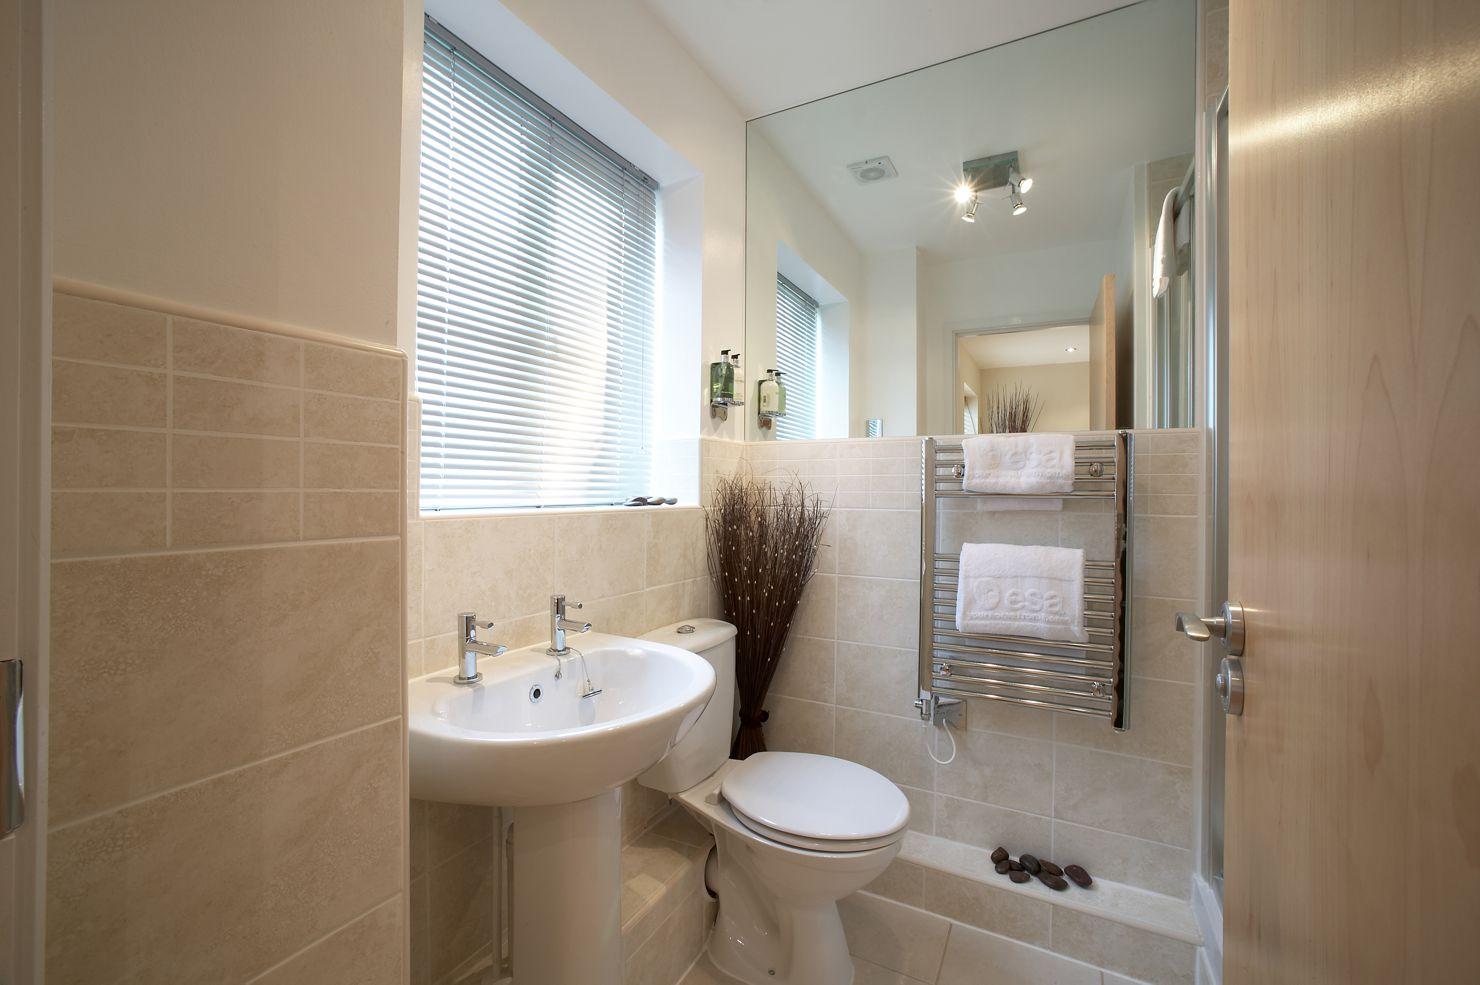 Southwich-House-Self-Catering-Accommodation-Swindon---Serviced-Apartments-Swindon-UK-|-Urban-Stay